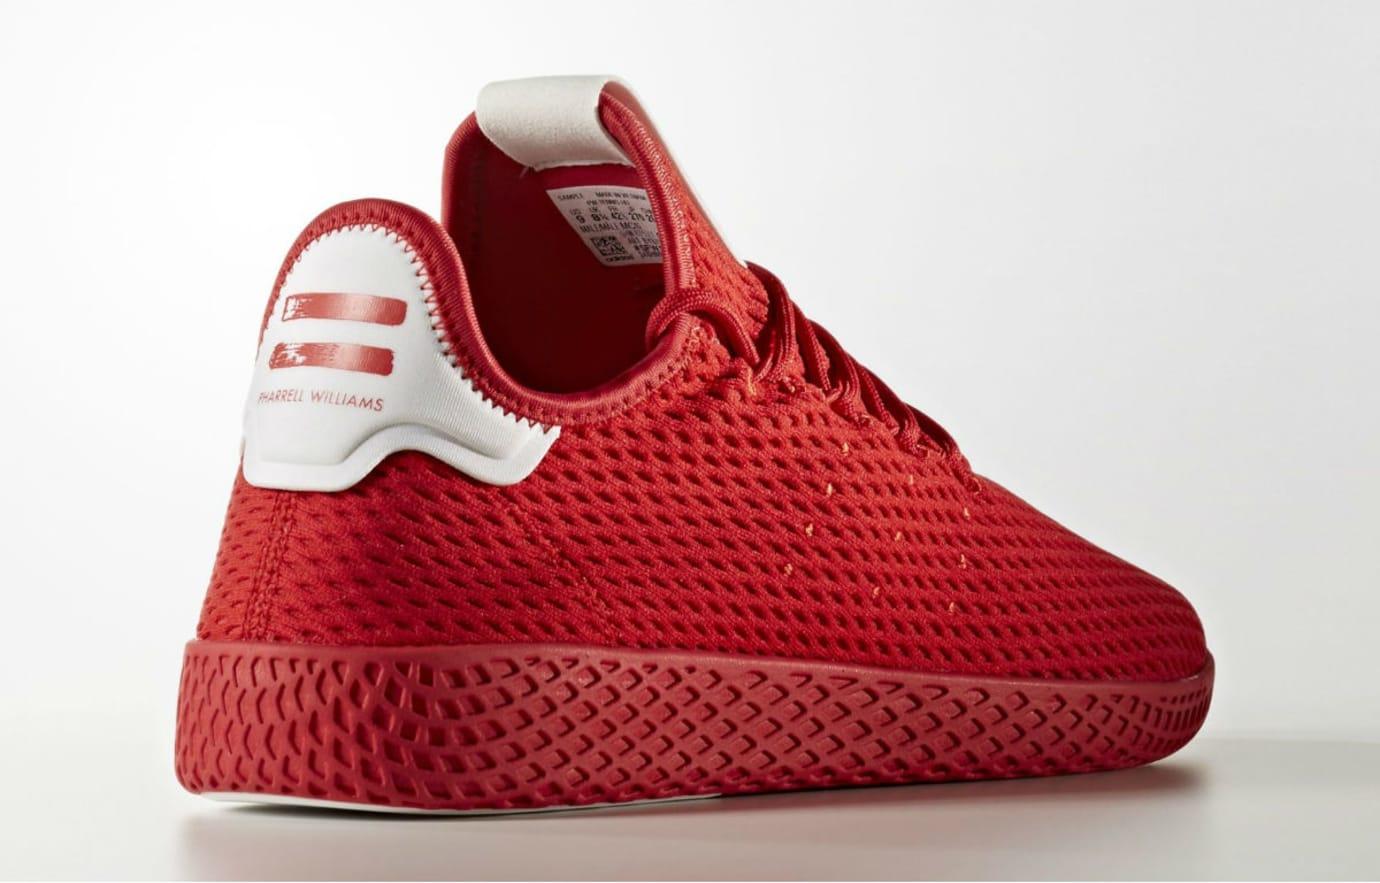 bfe2c5c3d0198 Pharrell x Adidas Tennis Hu Red   Navy Release Date